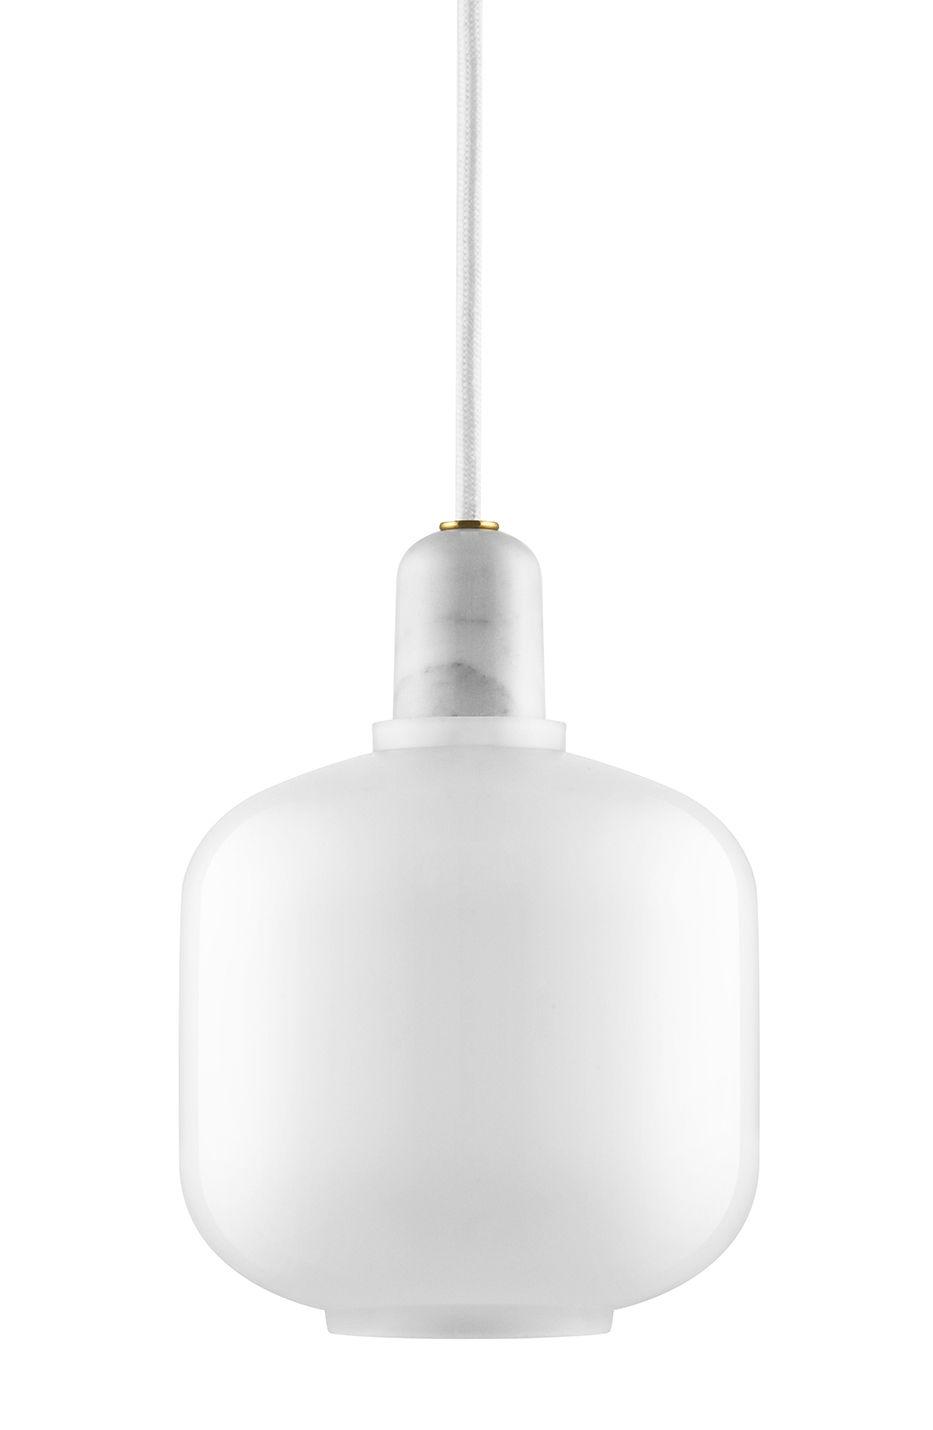 Luminaire - Suspensions - Suspension Amp Small / Ø 14 x H 17 cm - Verre & marbre - Normann Copenhagen - Blanc / Marbre blanc - Marbre, Verre